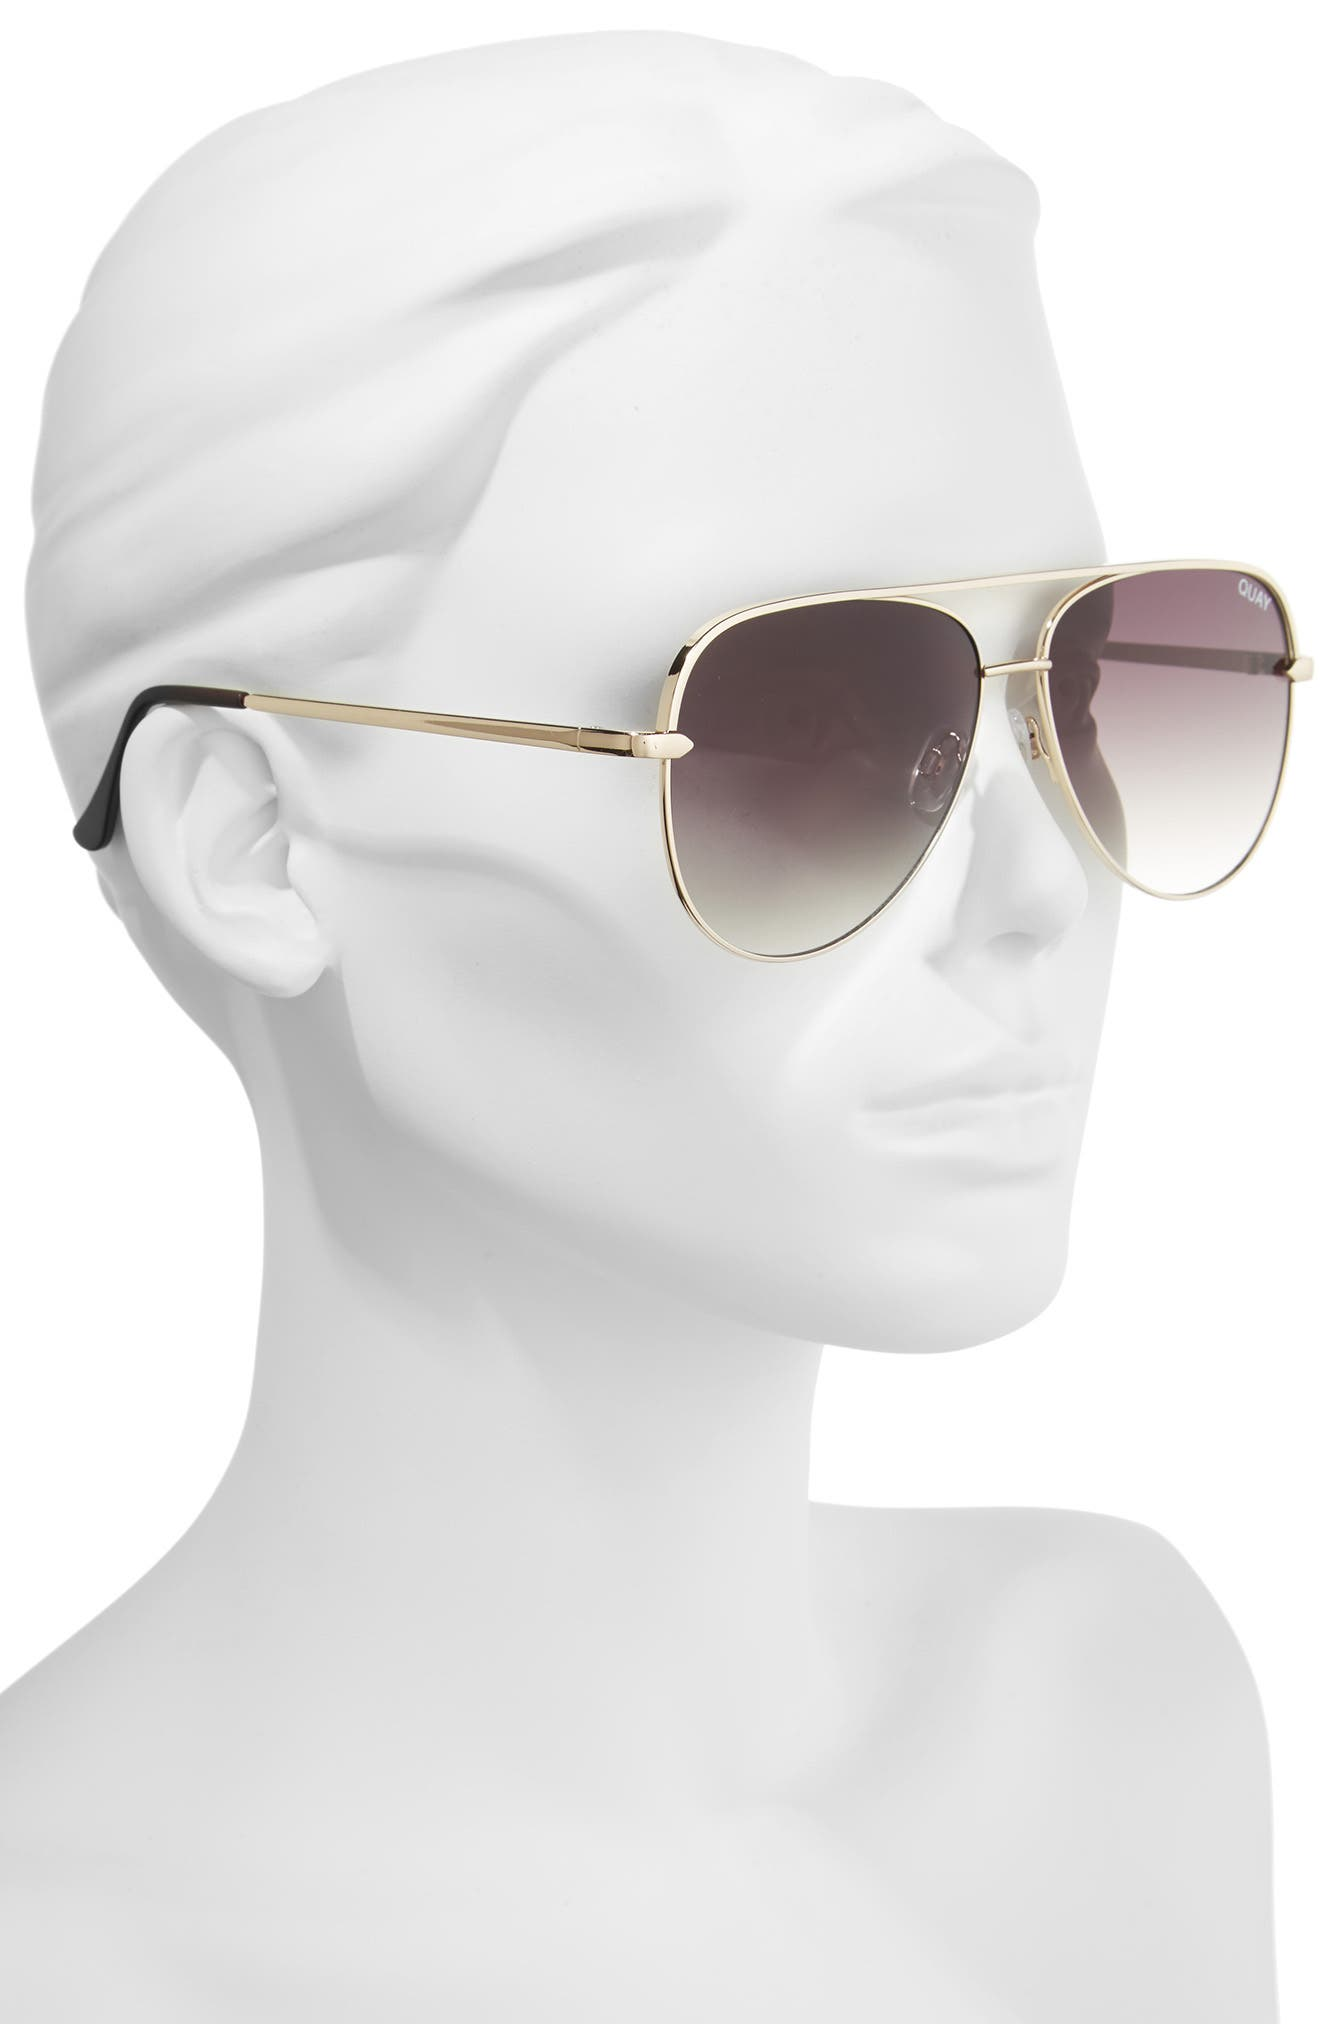 QUAY AUSTRALIA, x Desi Perkins Sahara 60mm Aviator Sunglasses, Alternate thumbnail 2, color, GOLD/ SMOKE